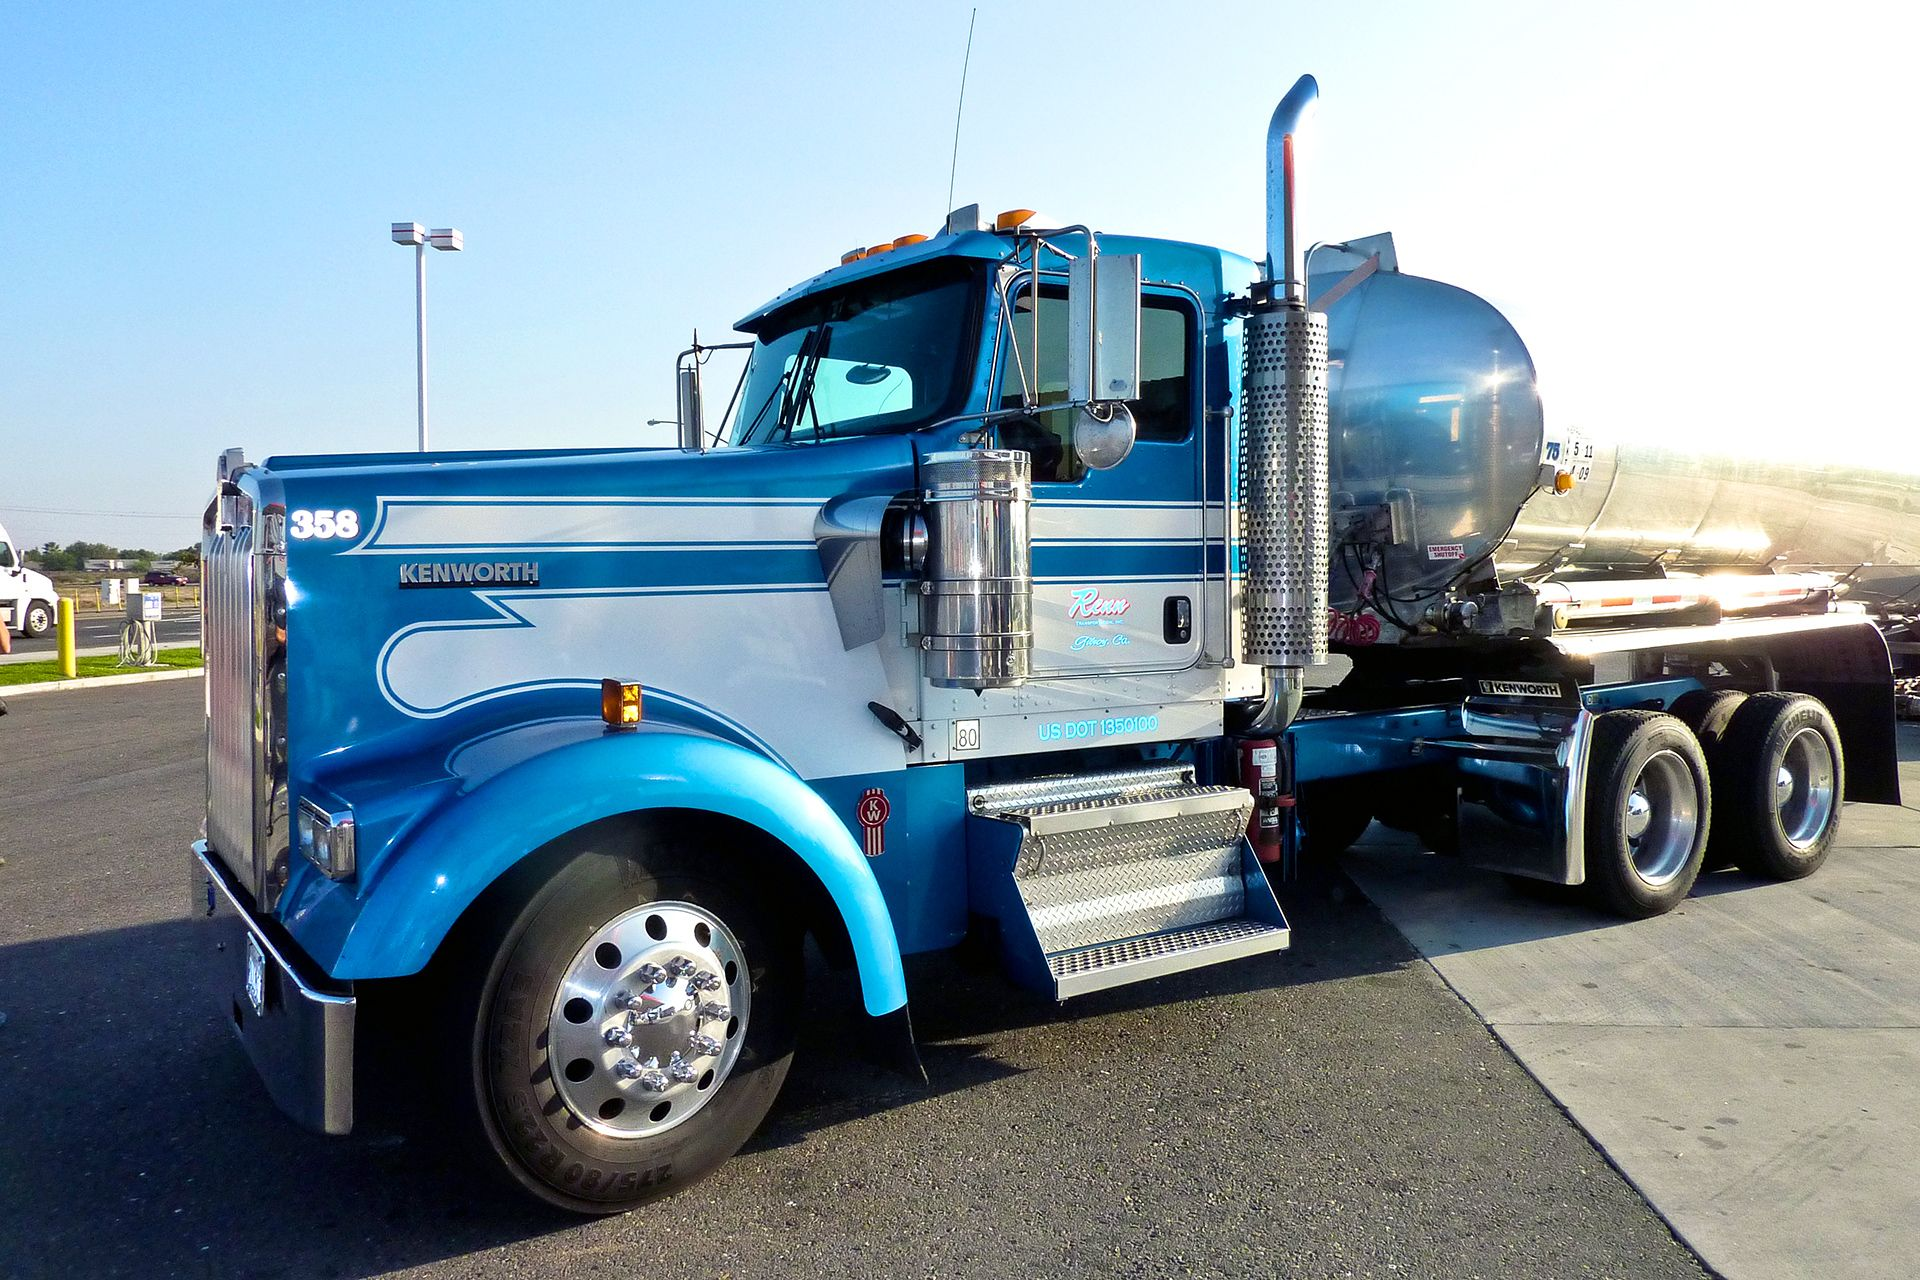 truck fahren in erding ab 189 ps kollos kontrollieren. Black Bedroom Furniture Sets. Home Design Ideas